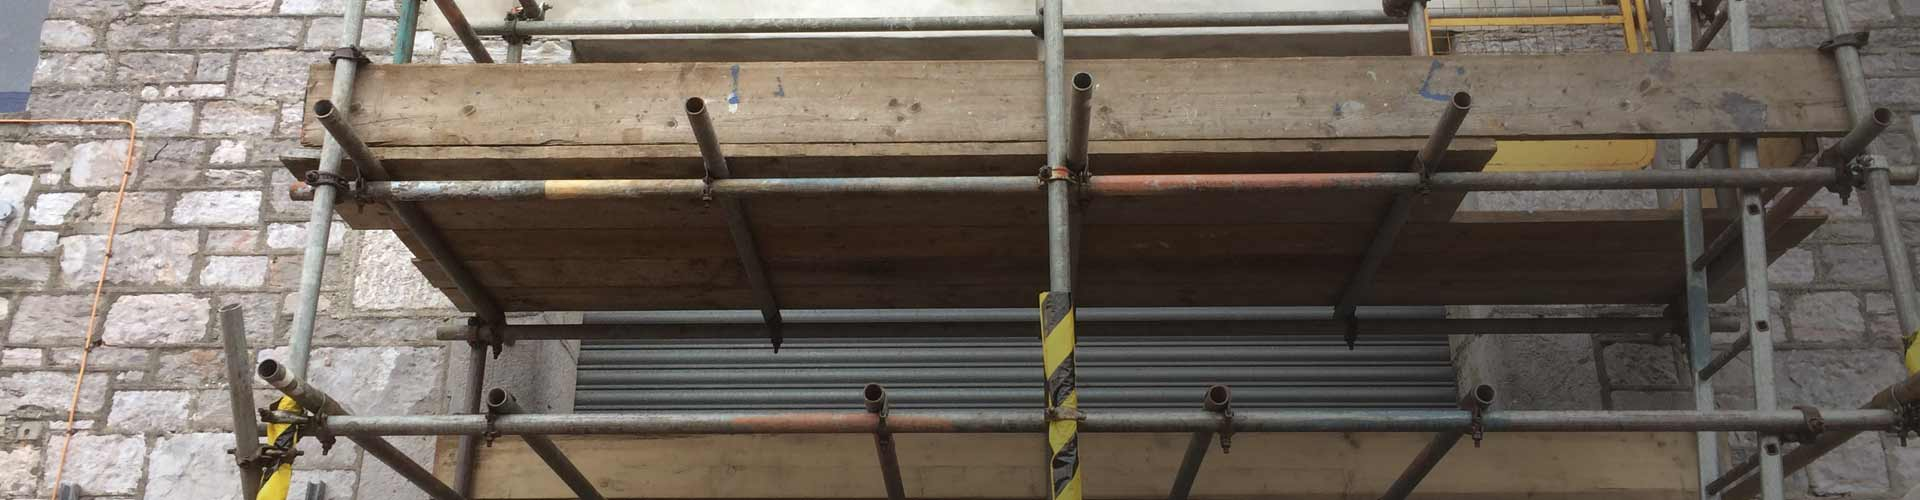 concrete repairs scaffolding a&a ashton